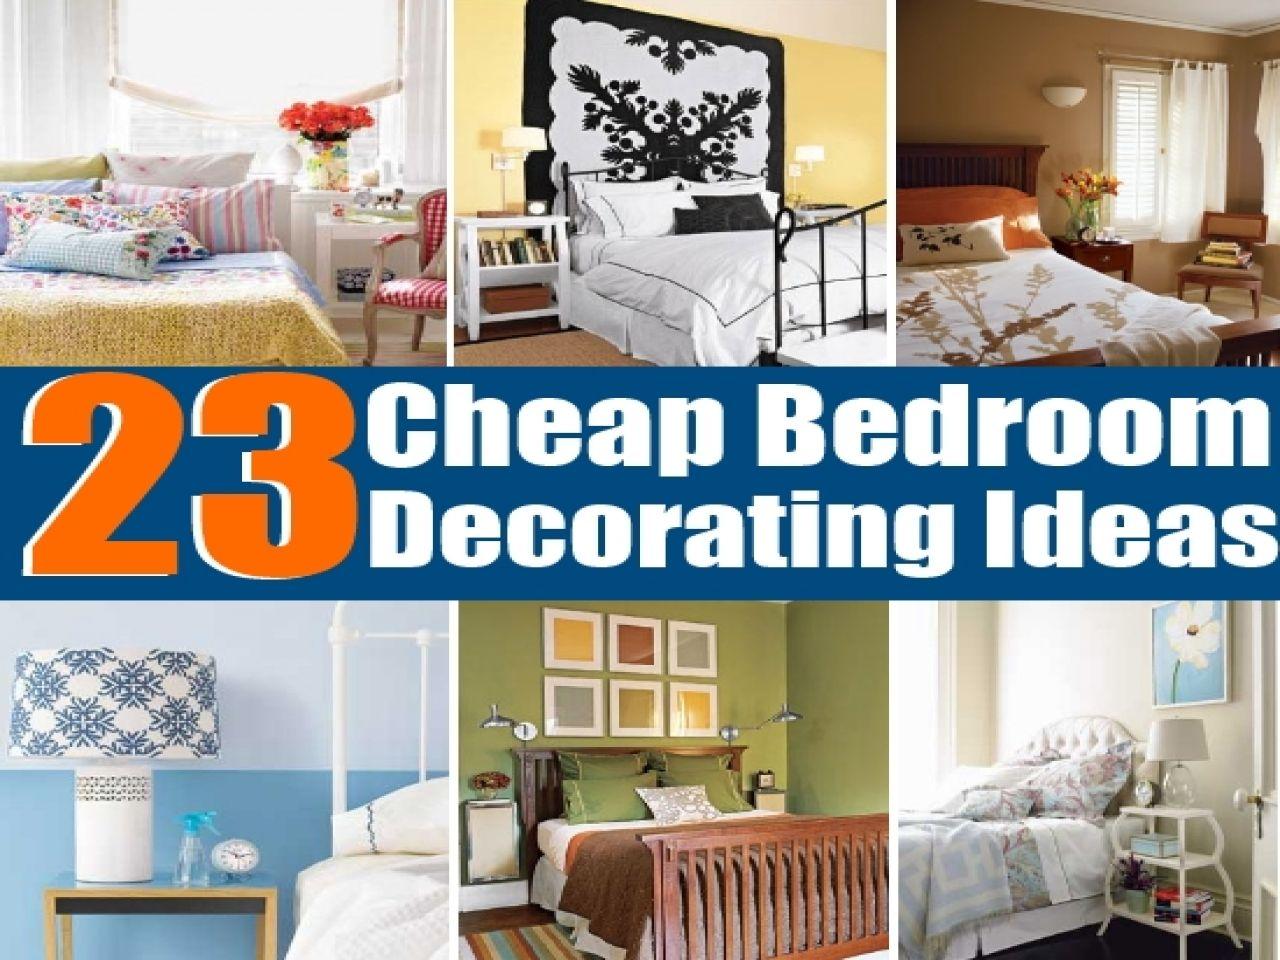 Cheap Bedroom Decorating Ideas | Cheap Diy Bedroom Decorating Ideas Www Tollebild Com